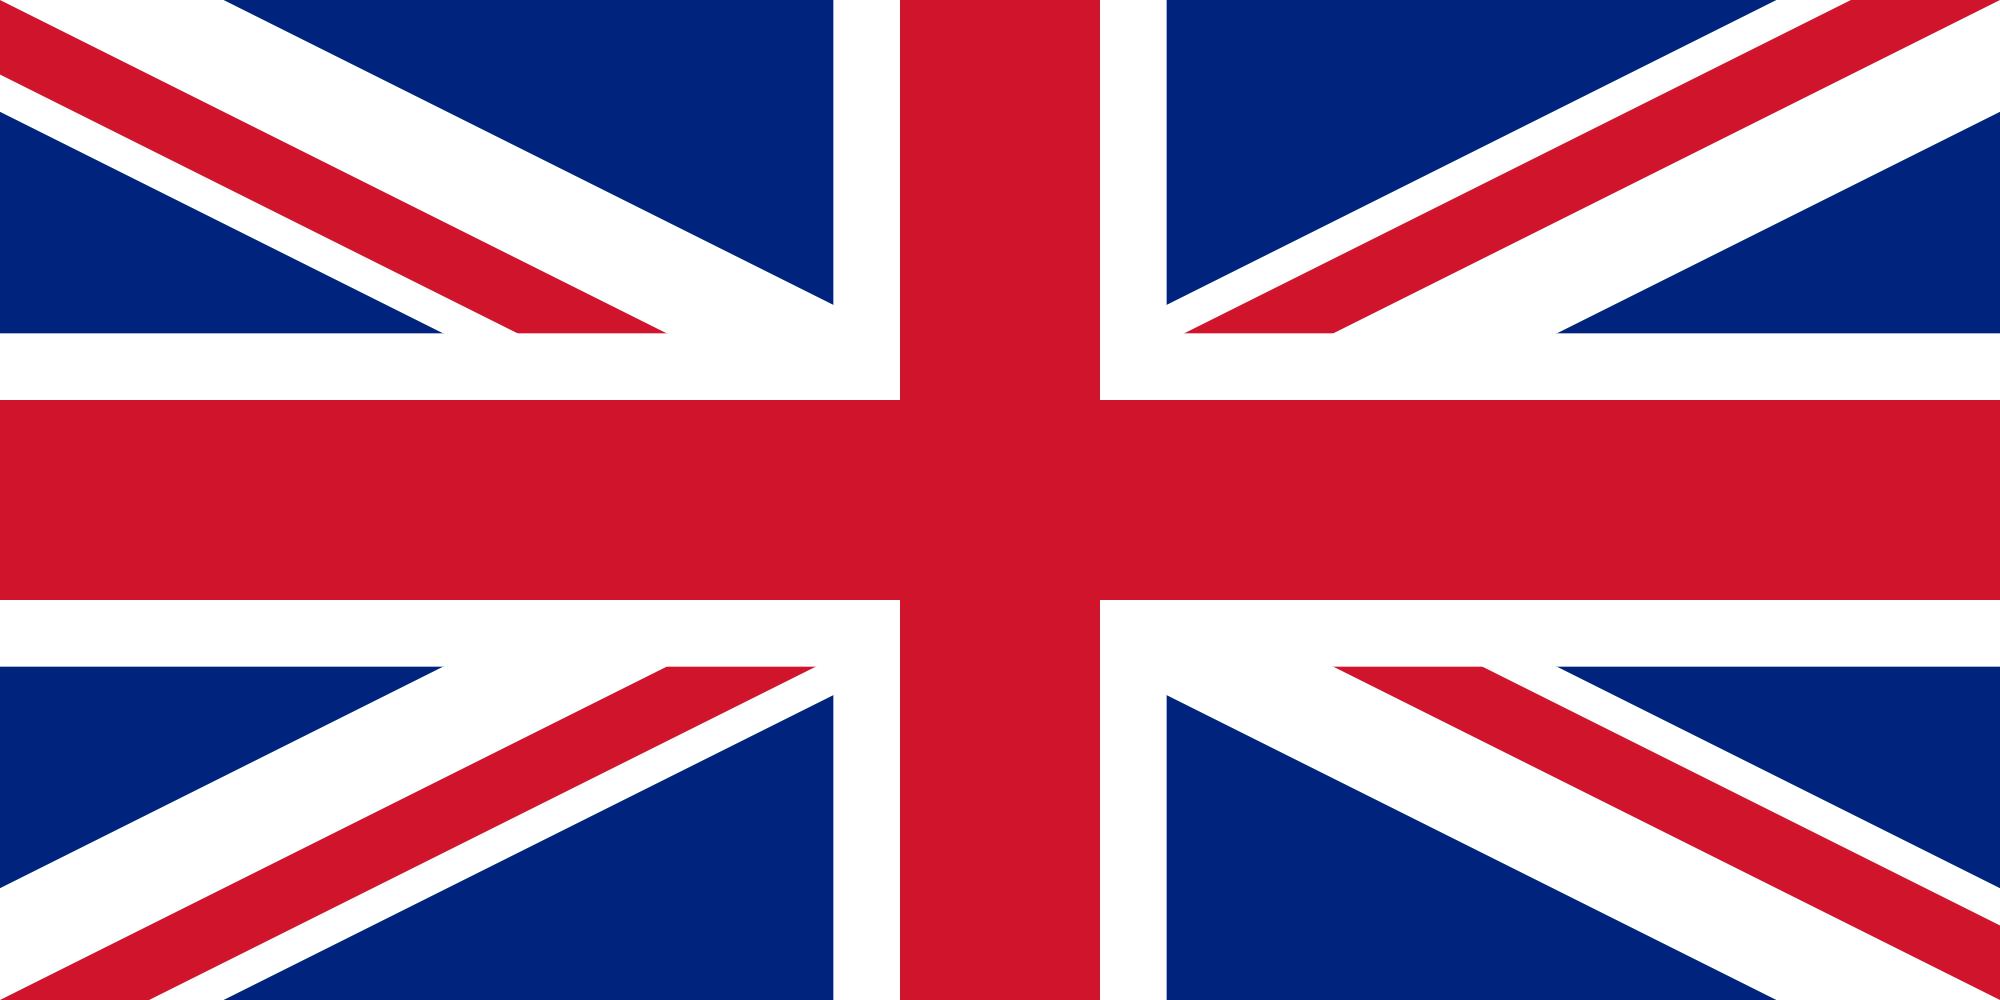 bandeira-do-reino-unido